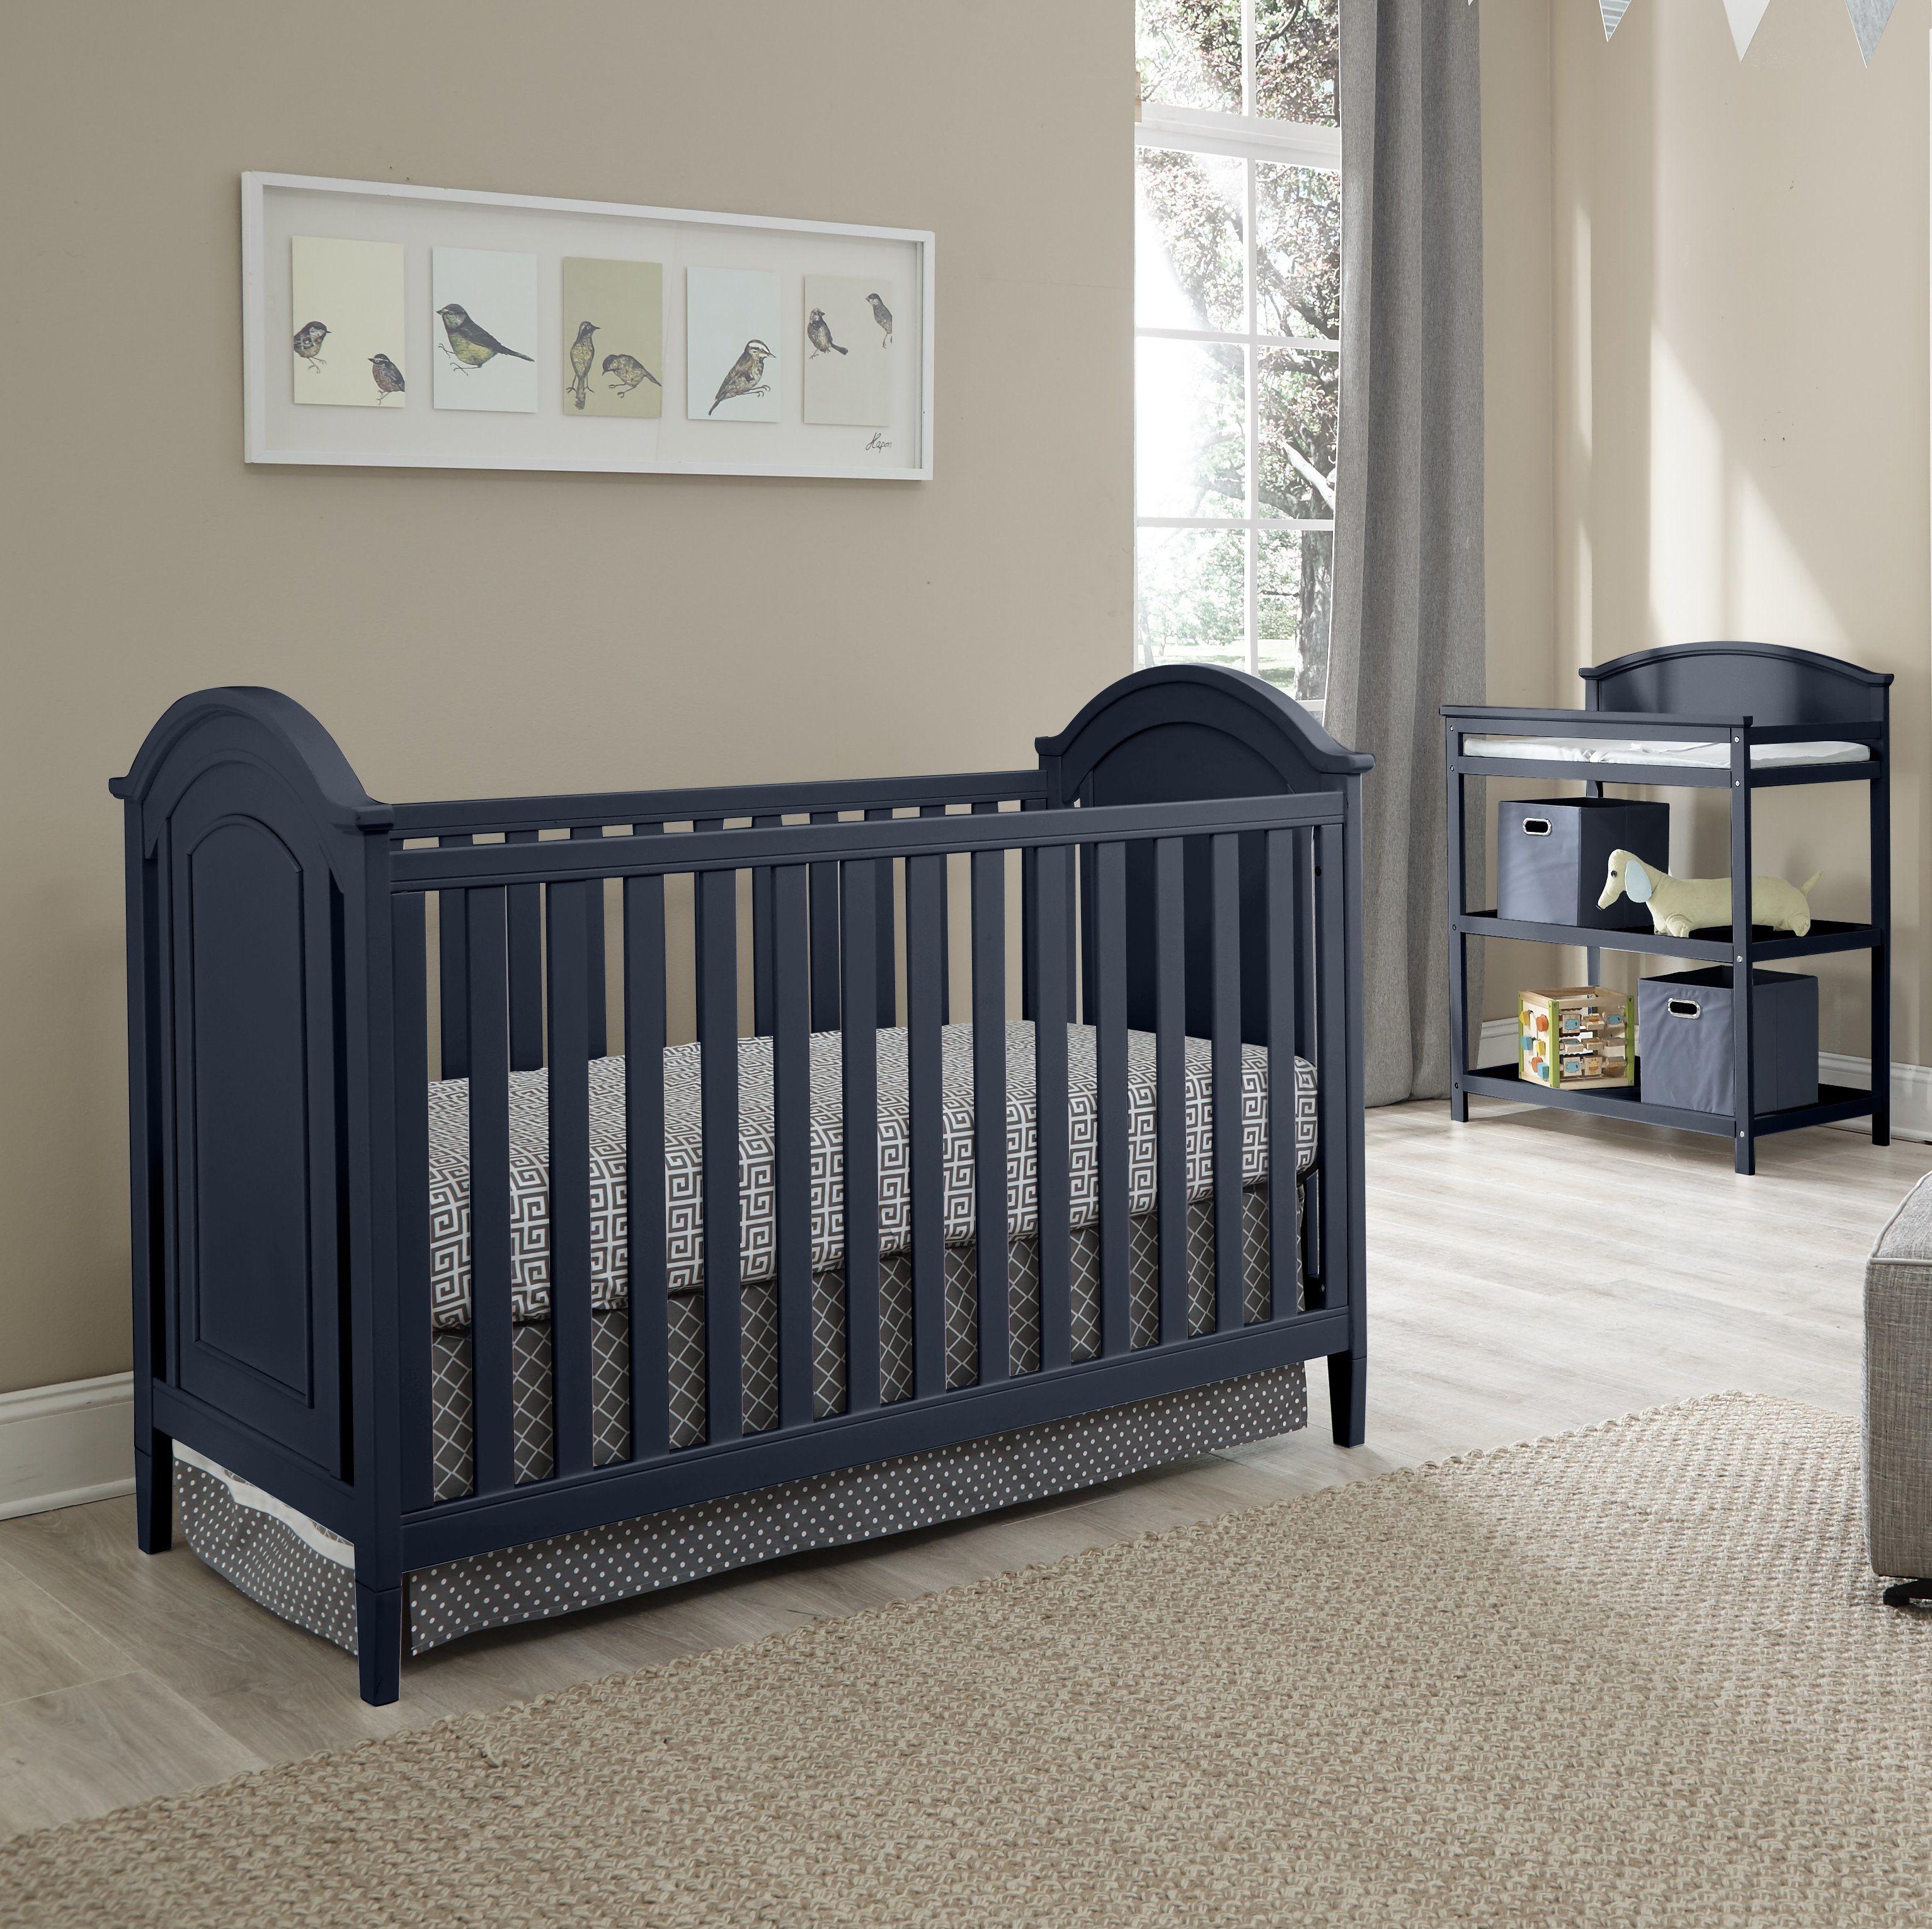 Emile 3 In 1 Convertible 3 Piece Crib Set Crib Sets Cribs Nursery Furniture Sets 3 piece crib set furniture